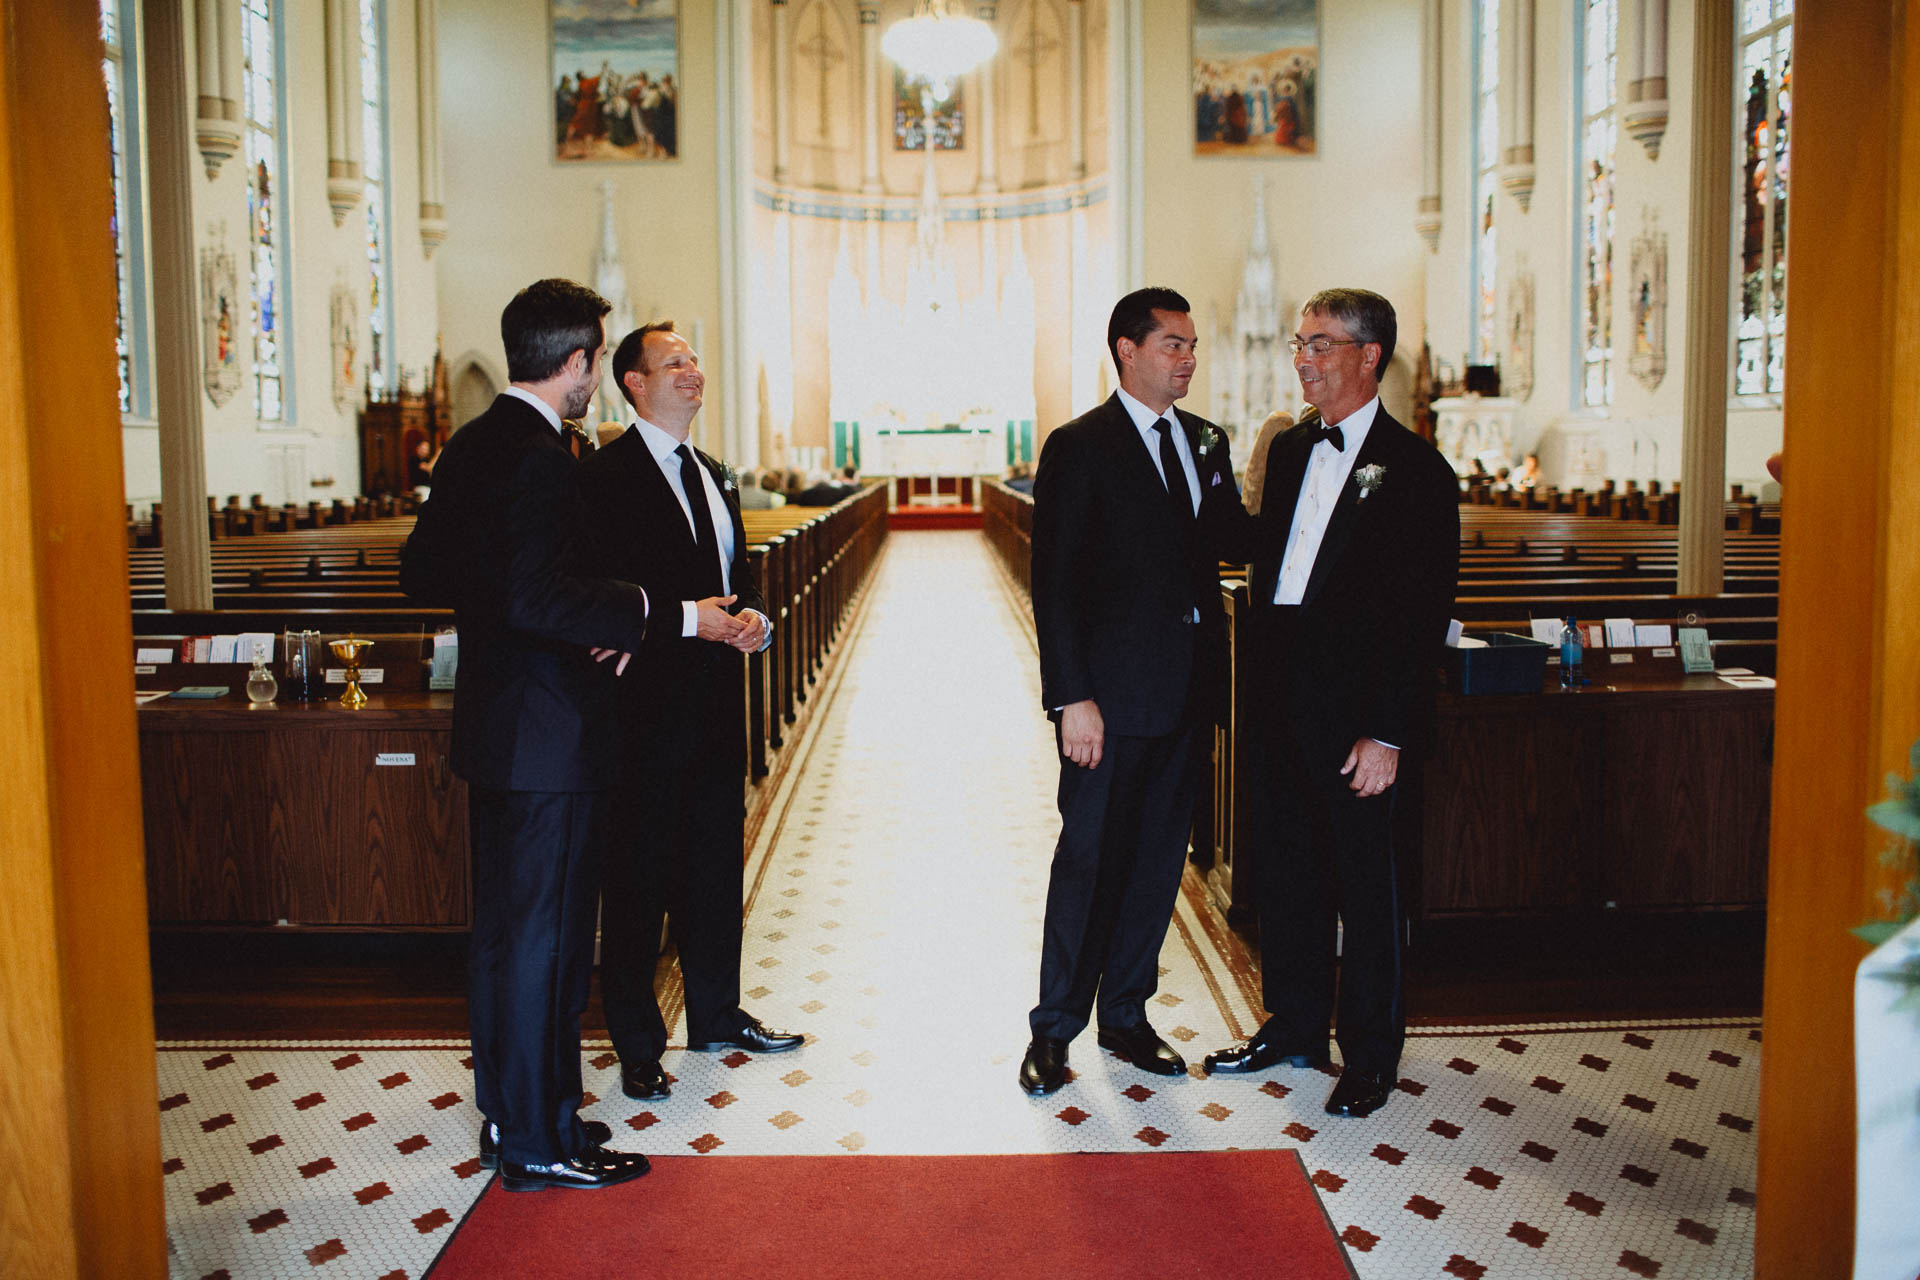 Keri-Joseph-Top-of-the-Market-Wedding-052@2x.jpg